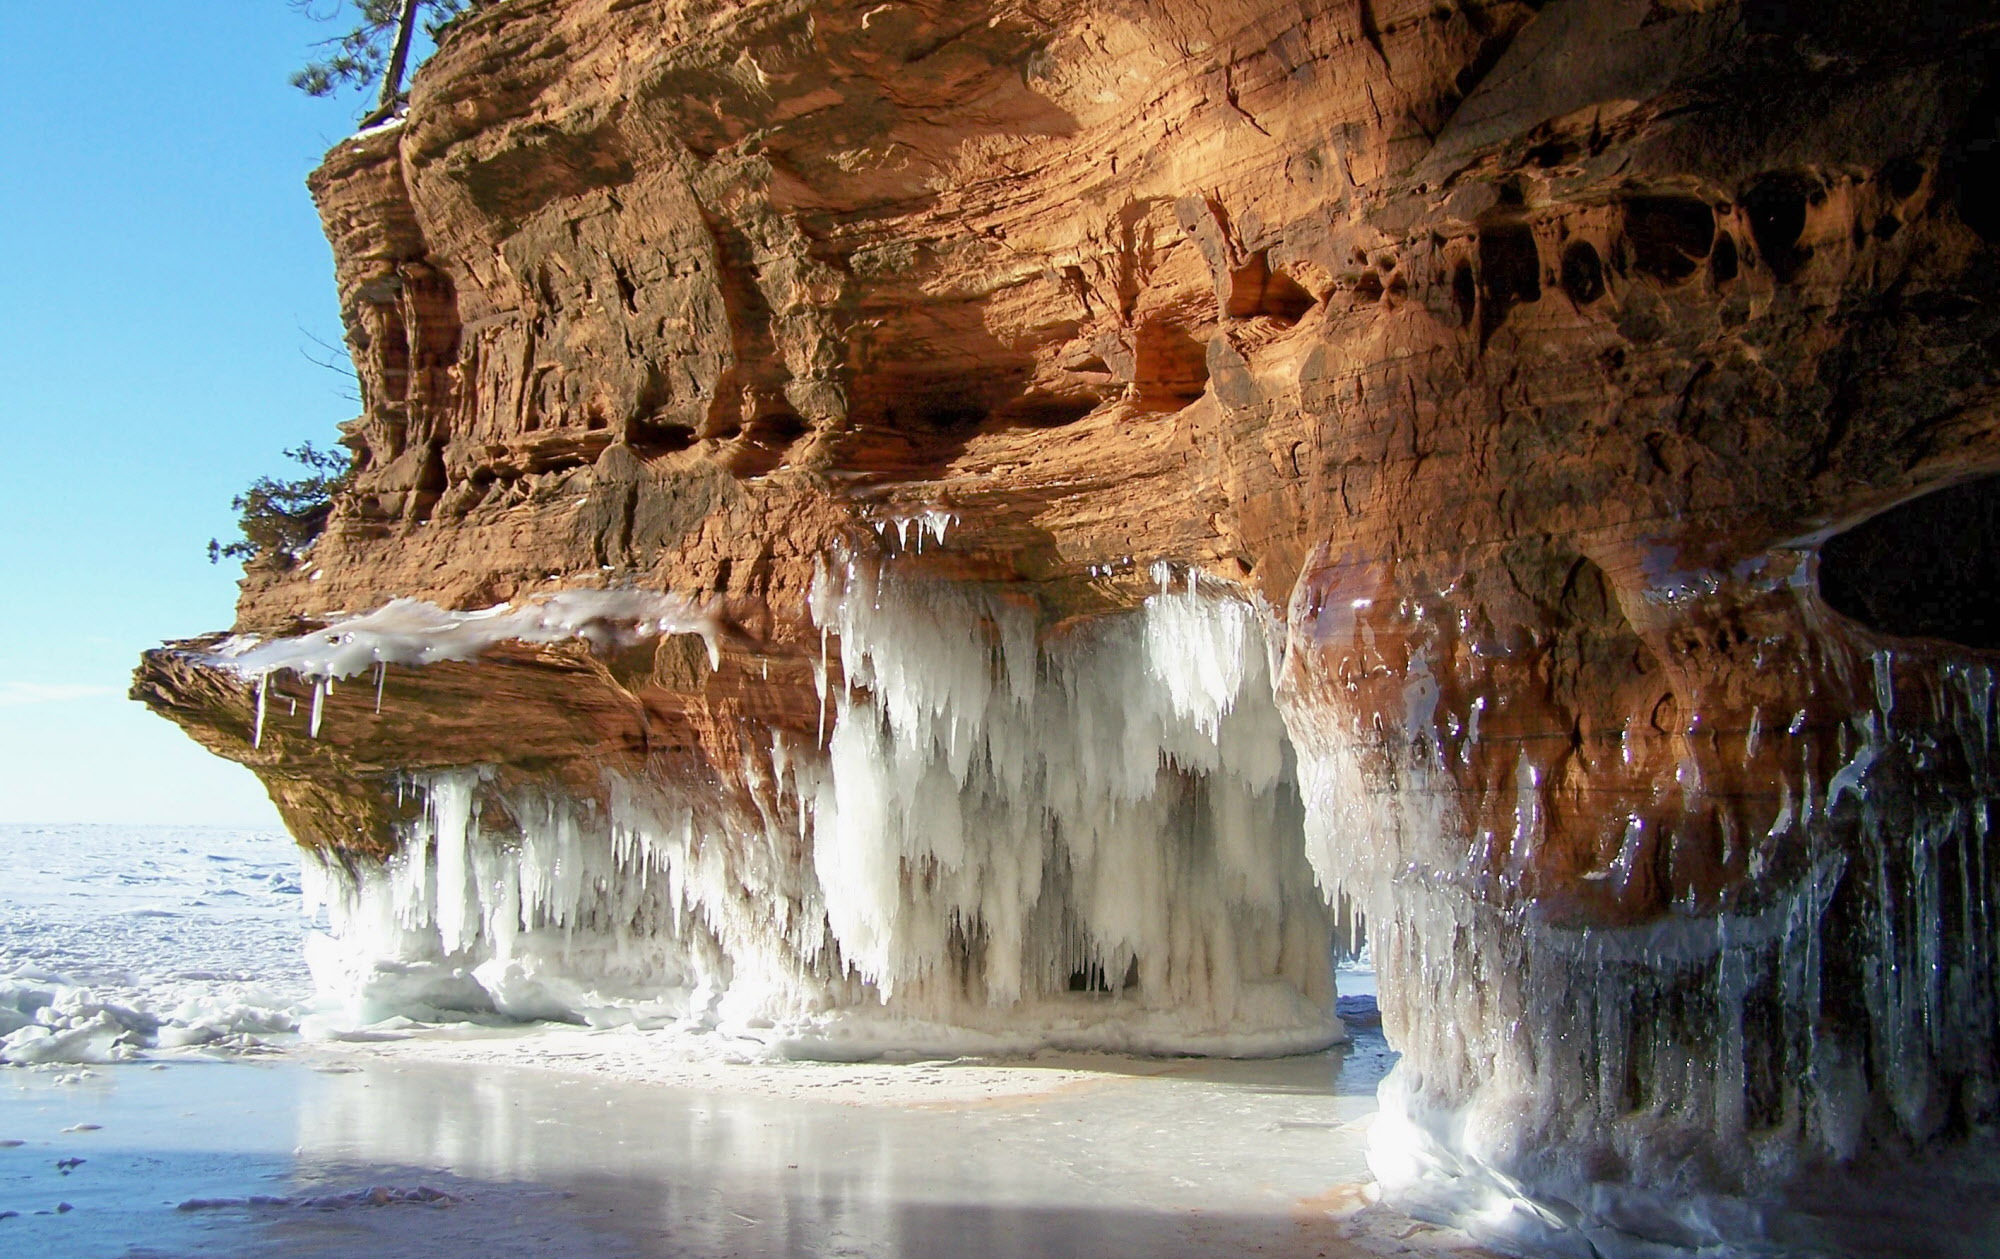 Frozen Sea Caves